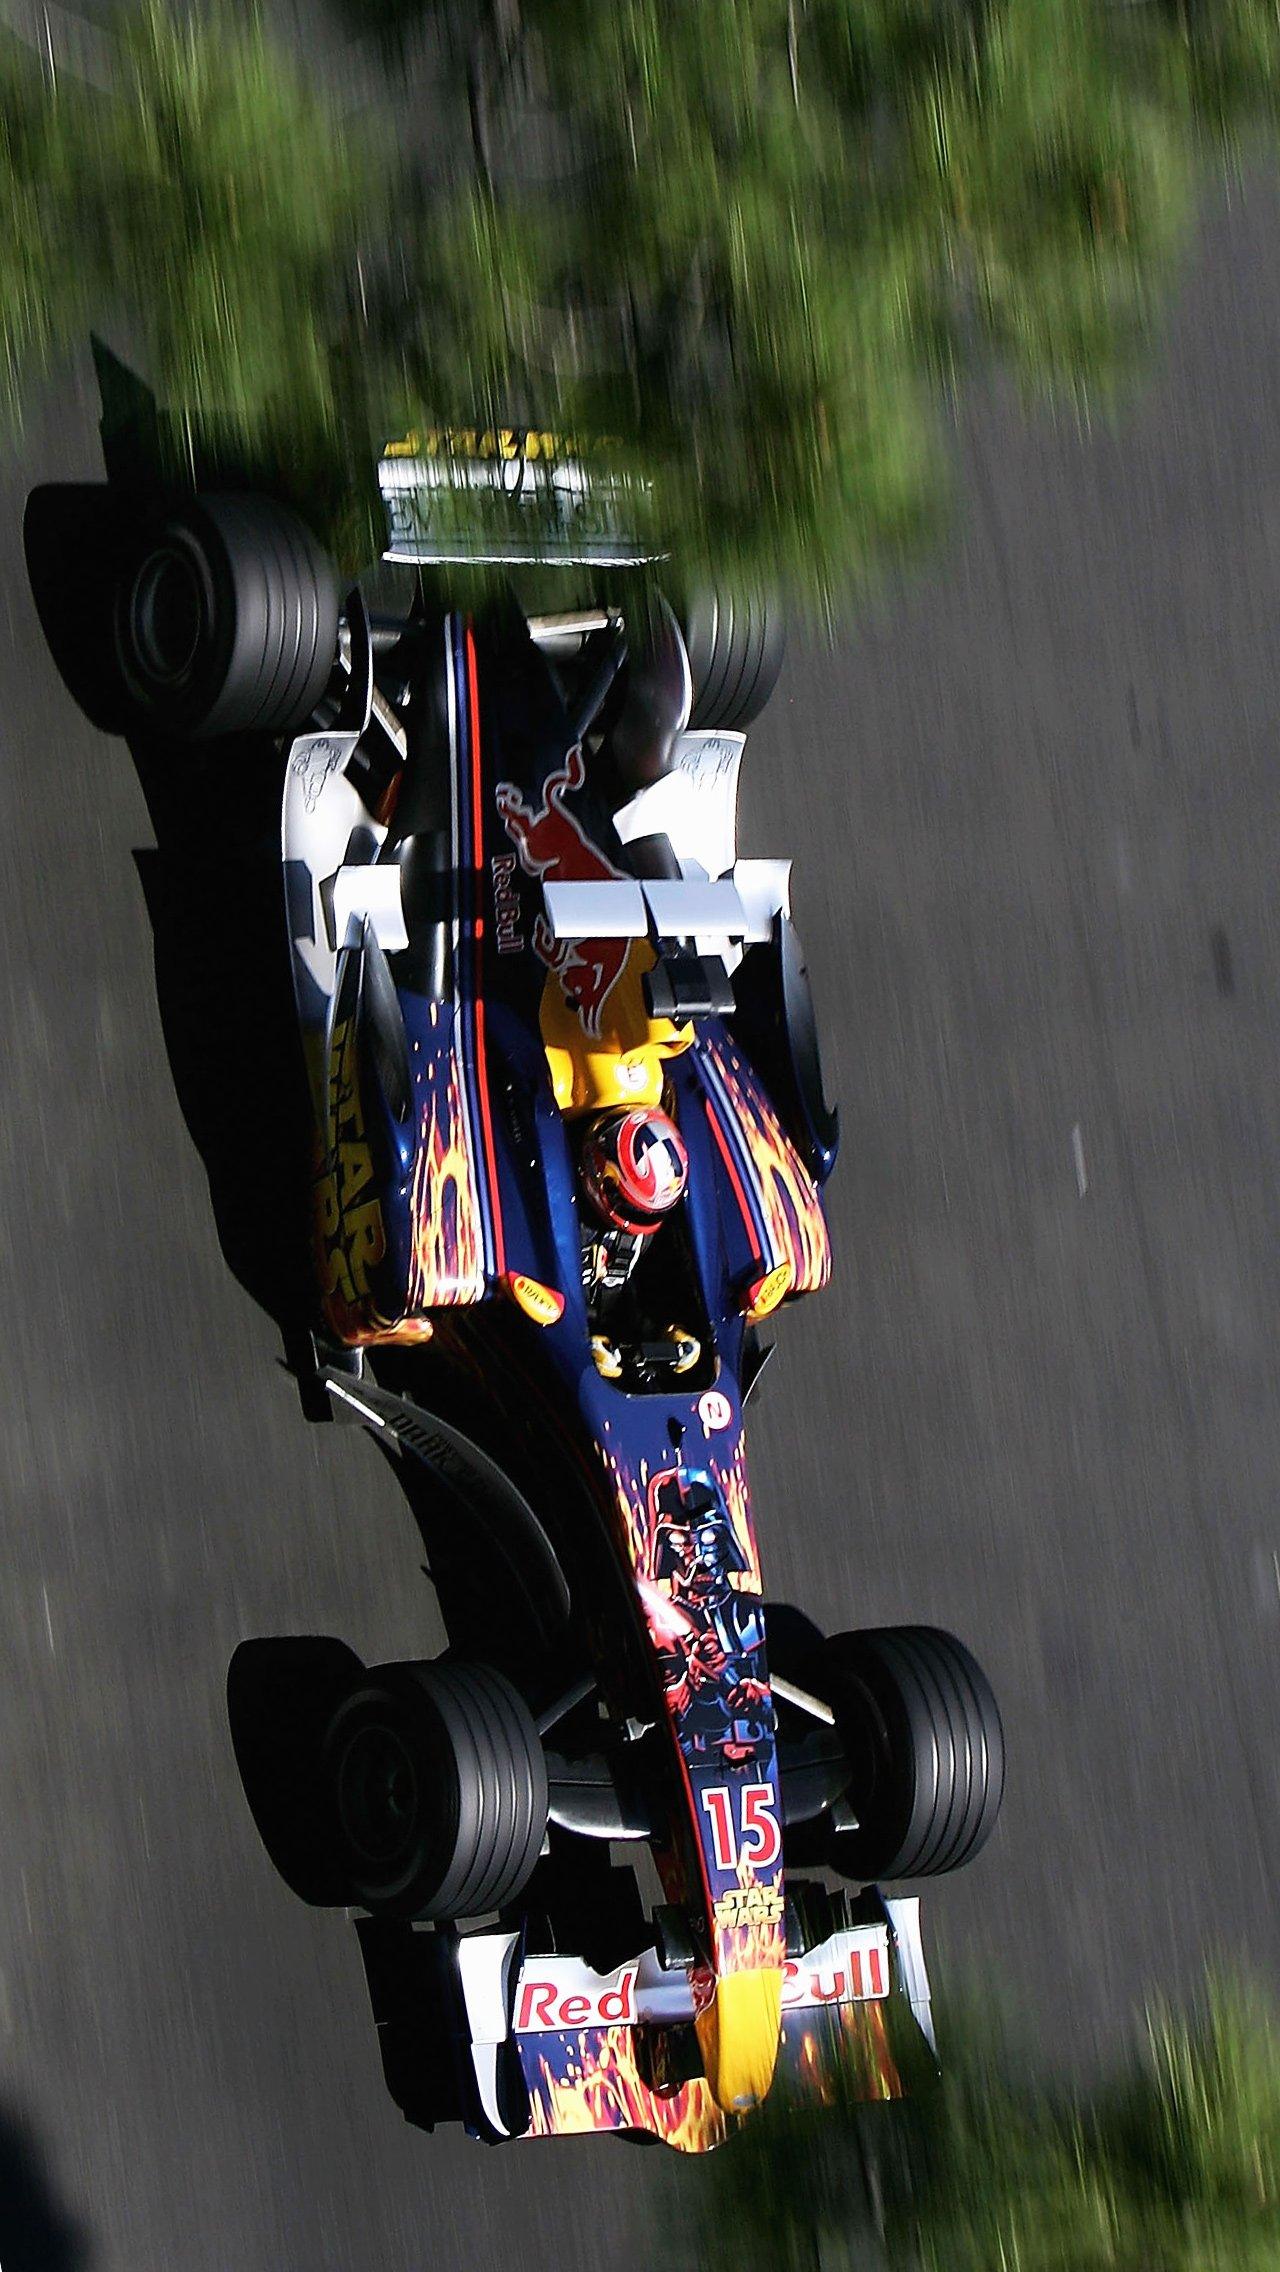 Гран-при Монако — 2005 памятен коллаборацией «Ред Булл» со «Звёздными войнами».